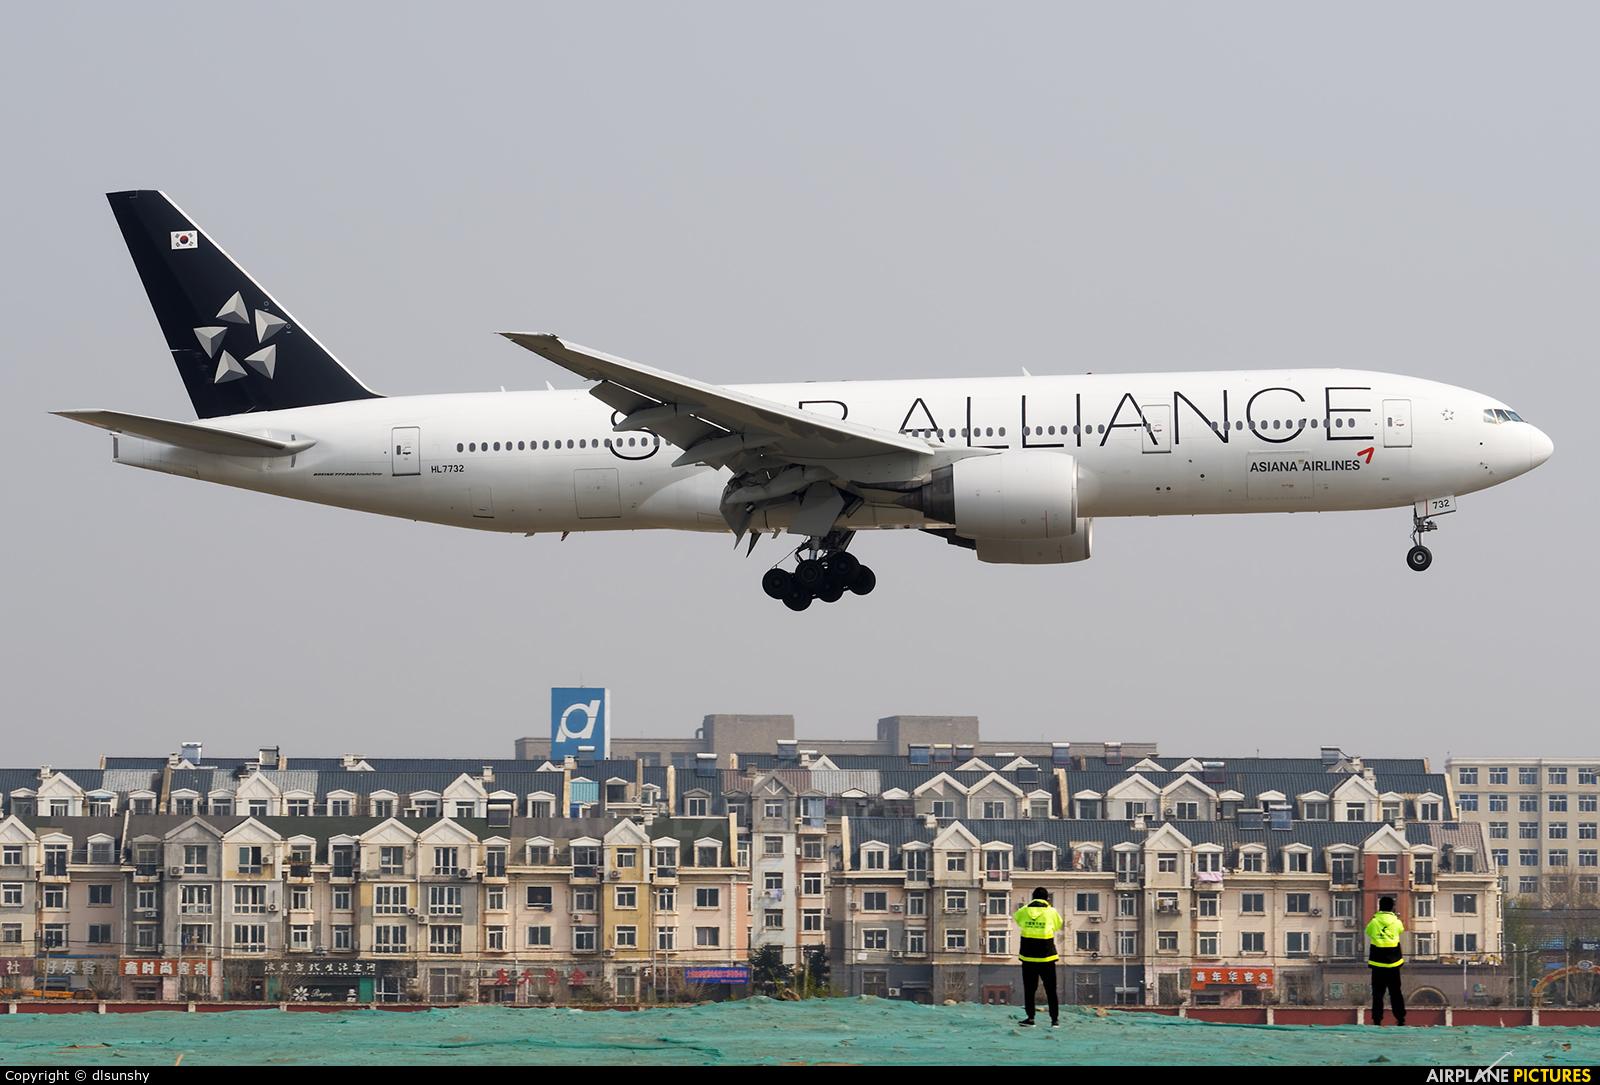 Asiana Airlines HL7732 aircraft at Dalian Zhoushuizi Int'l